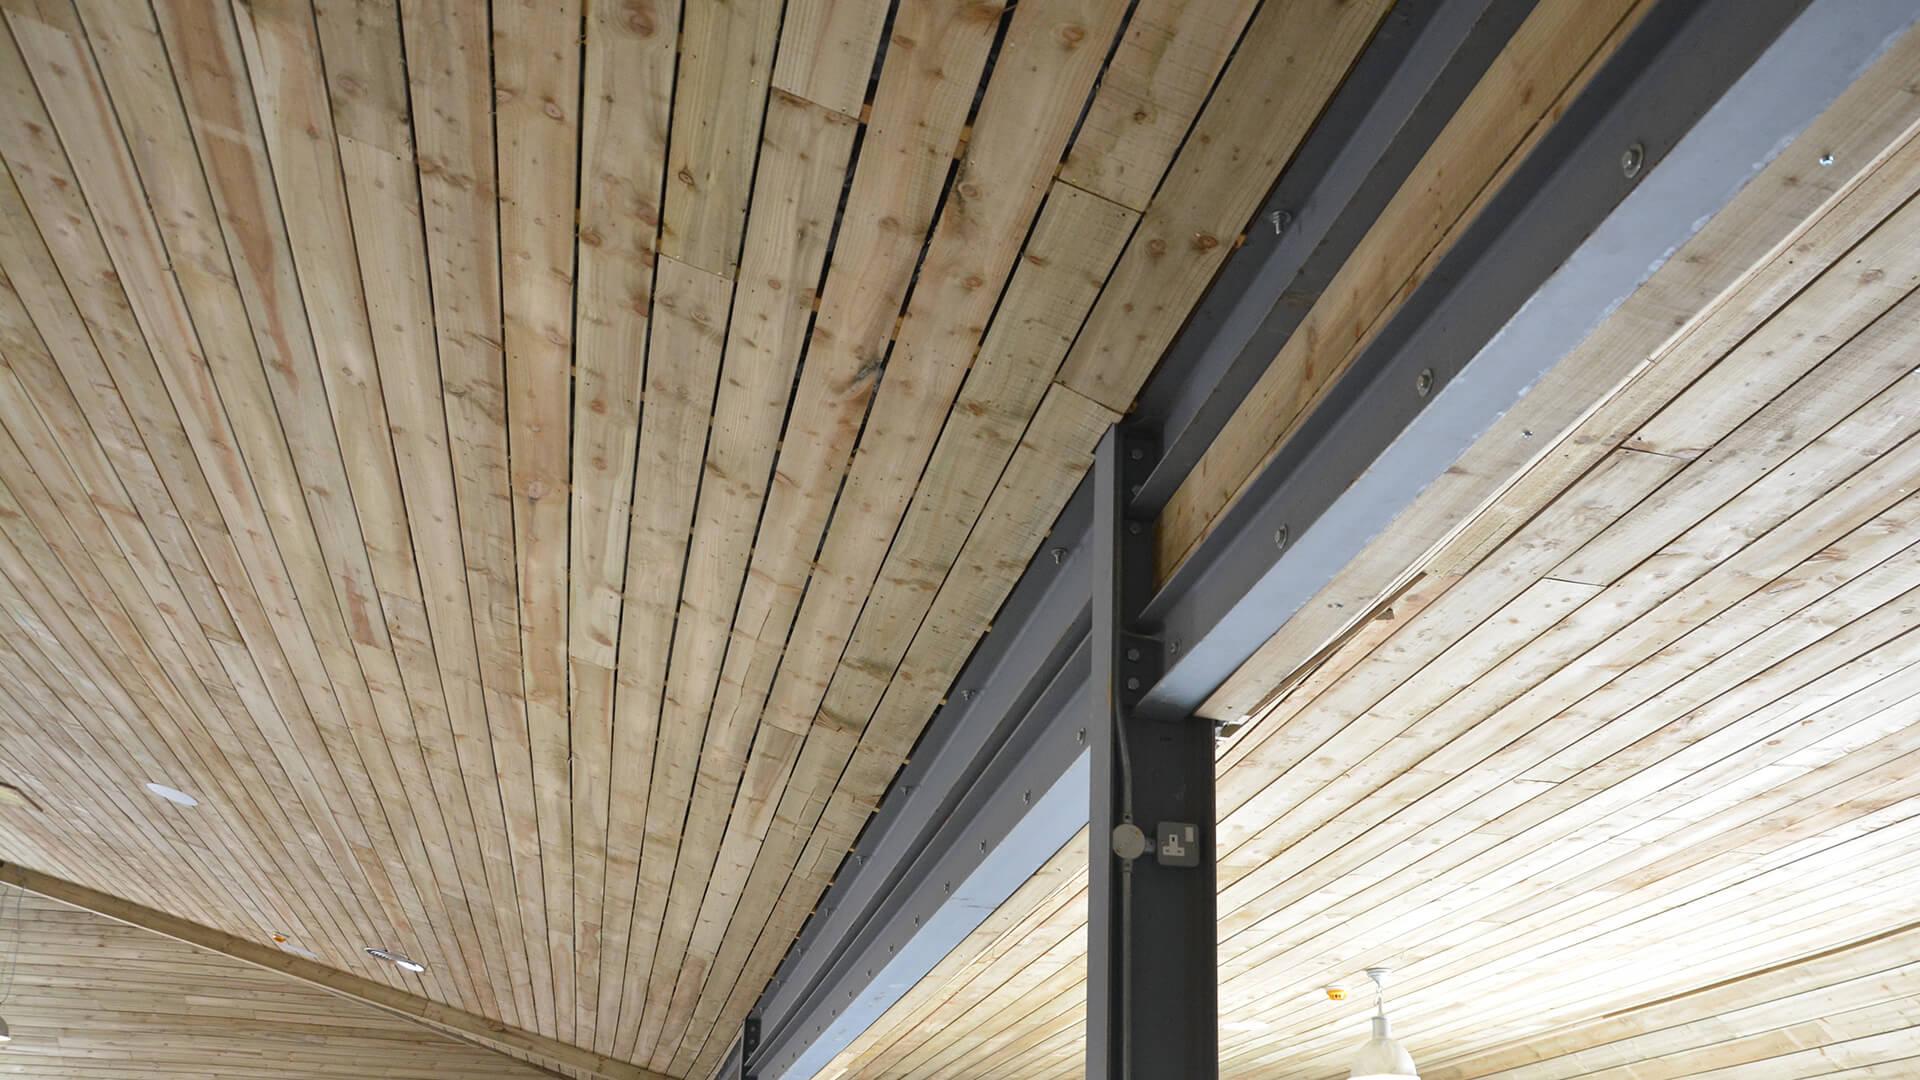 Falside Mill Venue close up of support beams